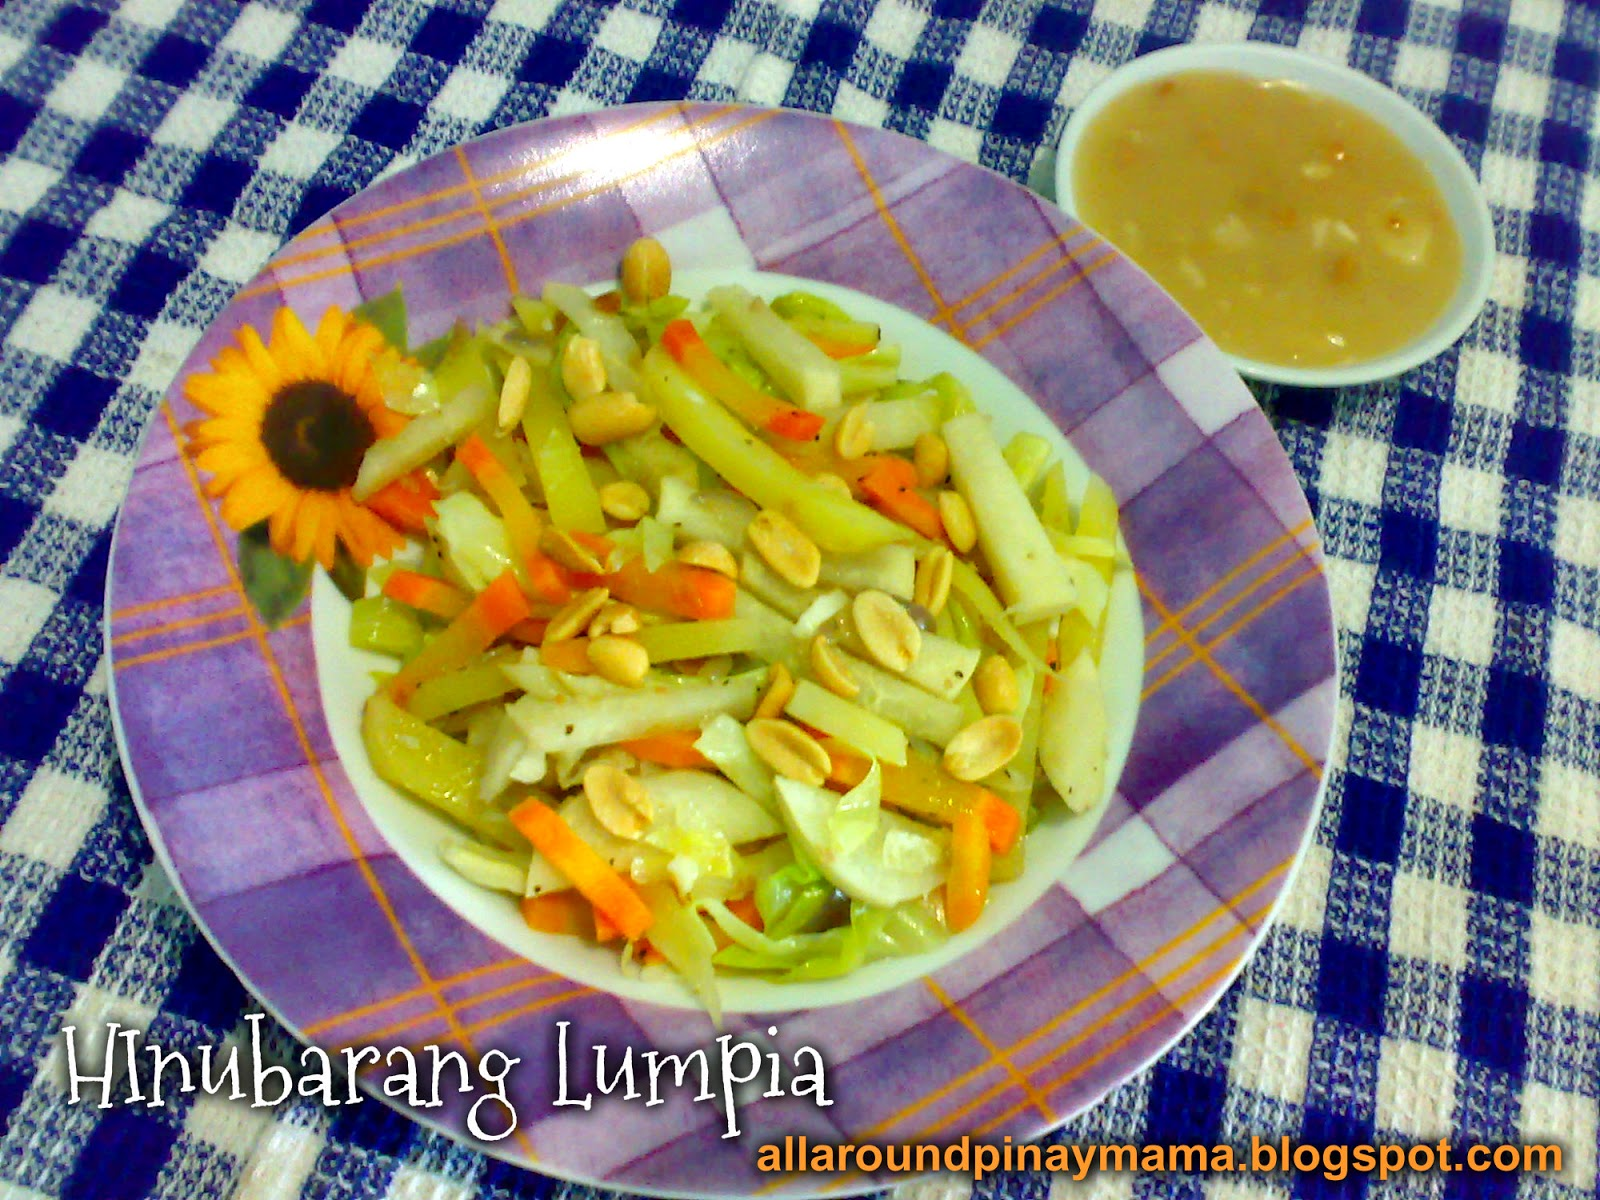 Ajinomoto Porksavor™ All-in-One Seasoning Cook and Blog